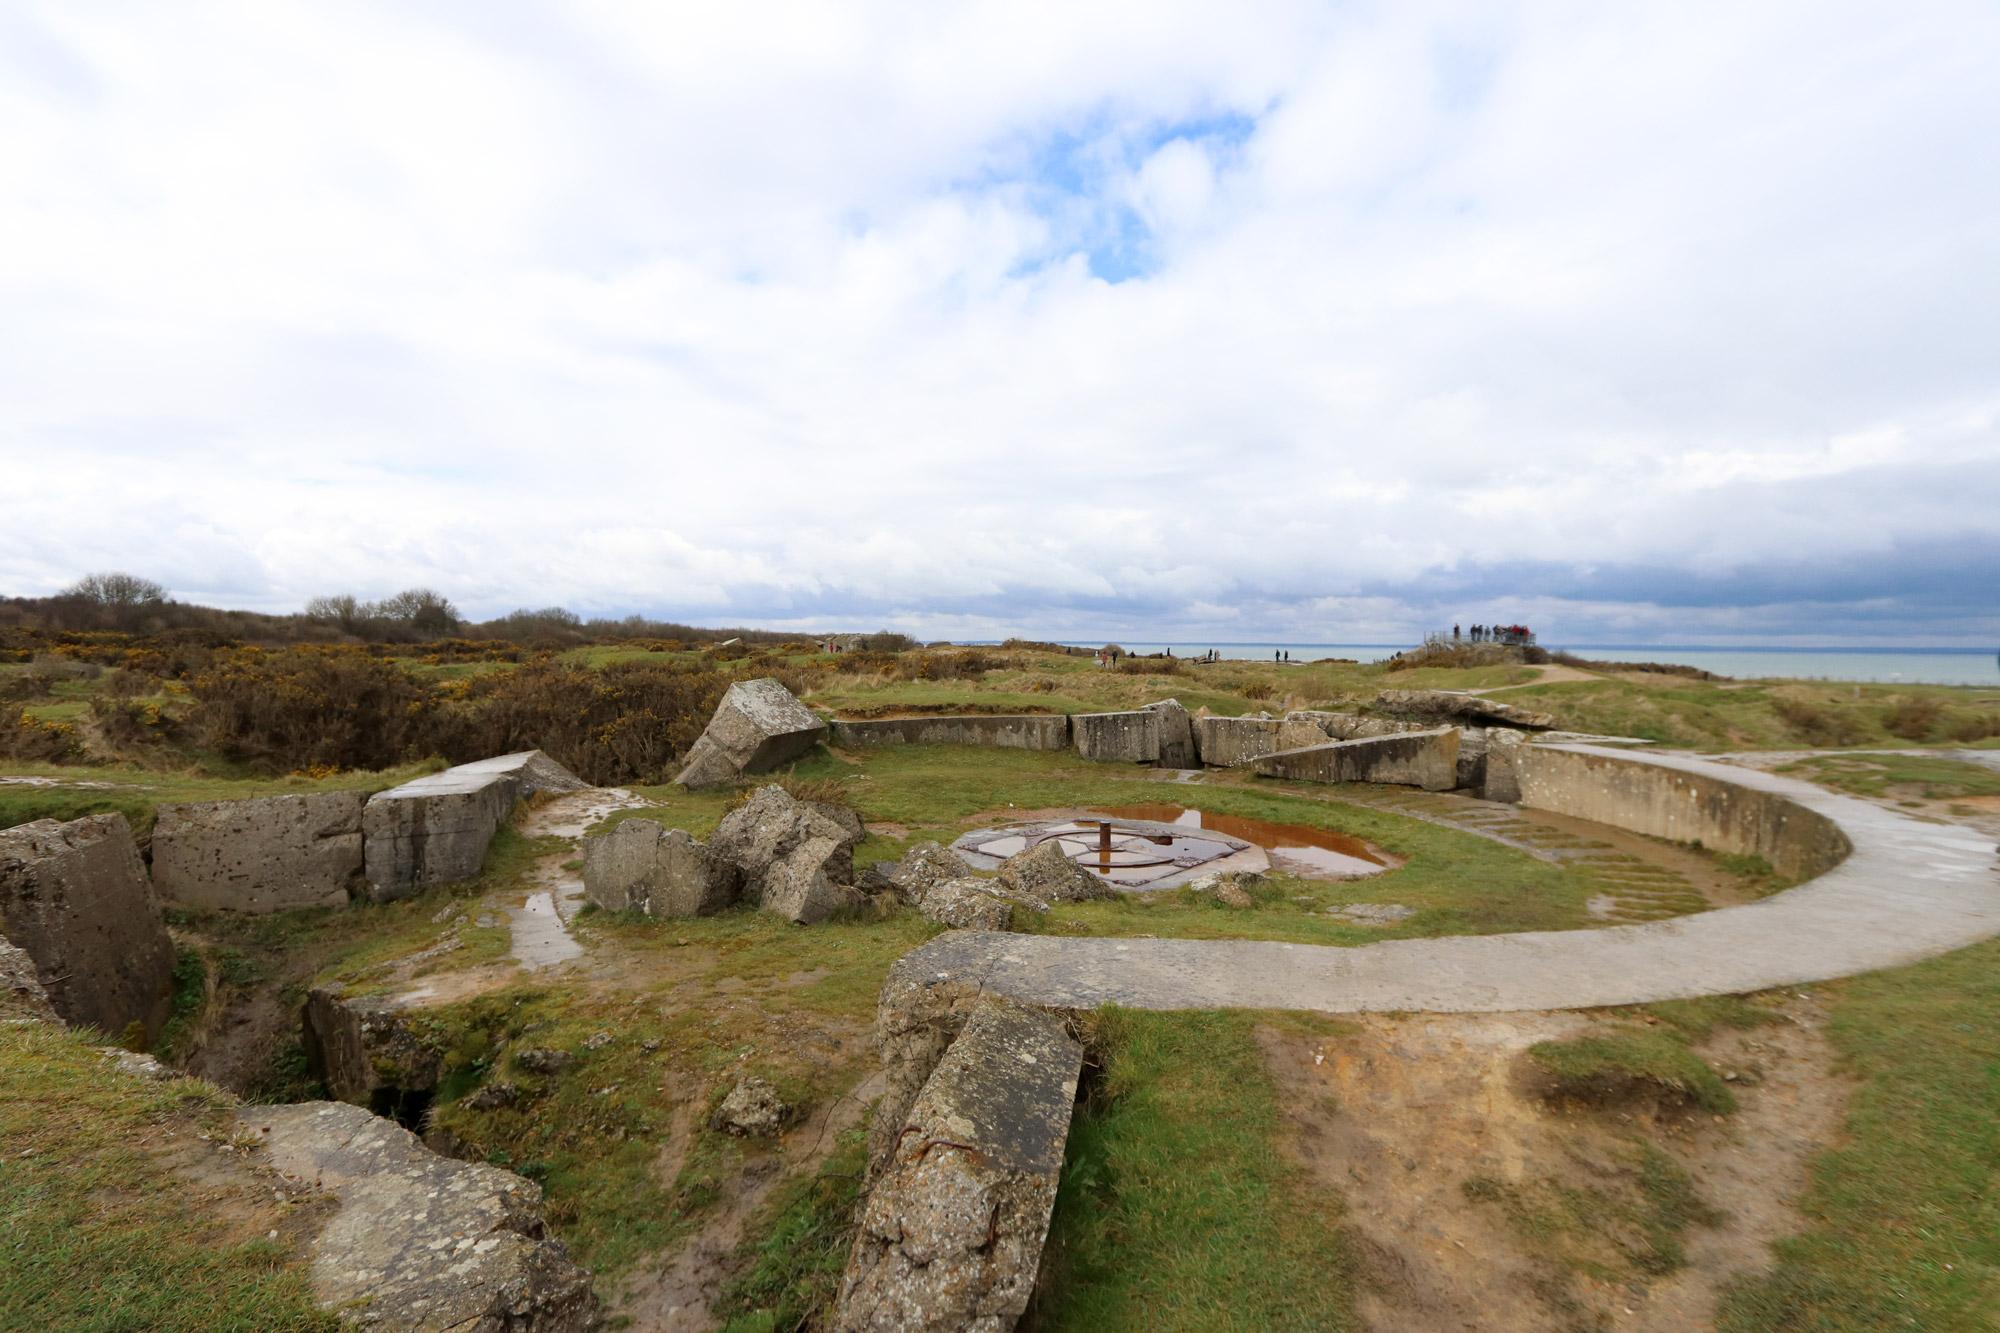 Fotoverslag Normandië - Pointe du Hoc